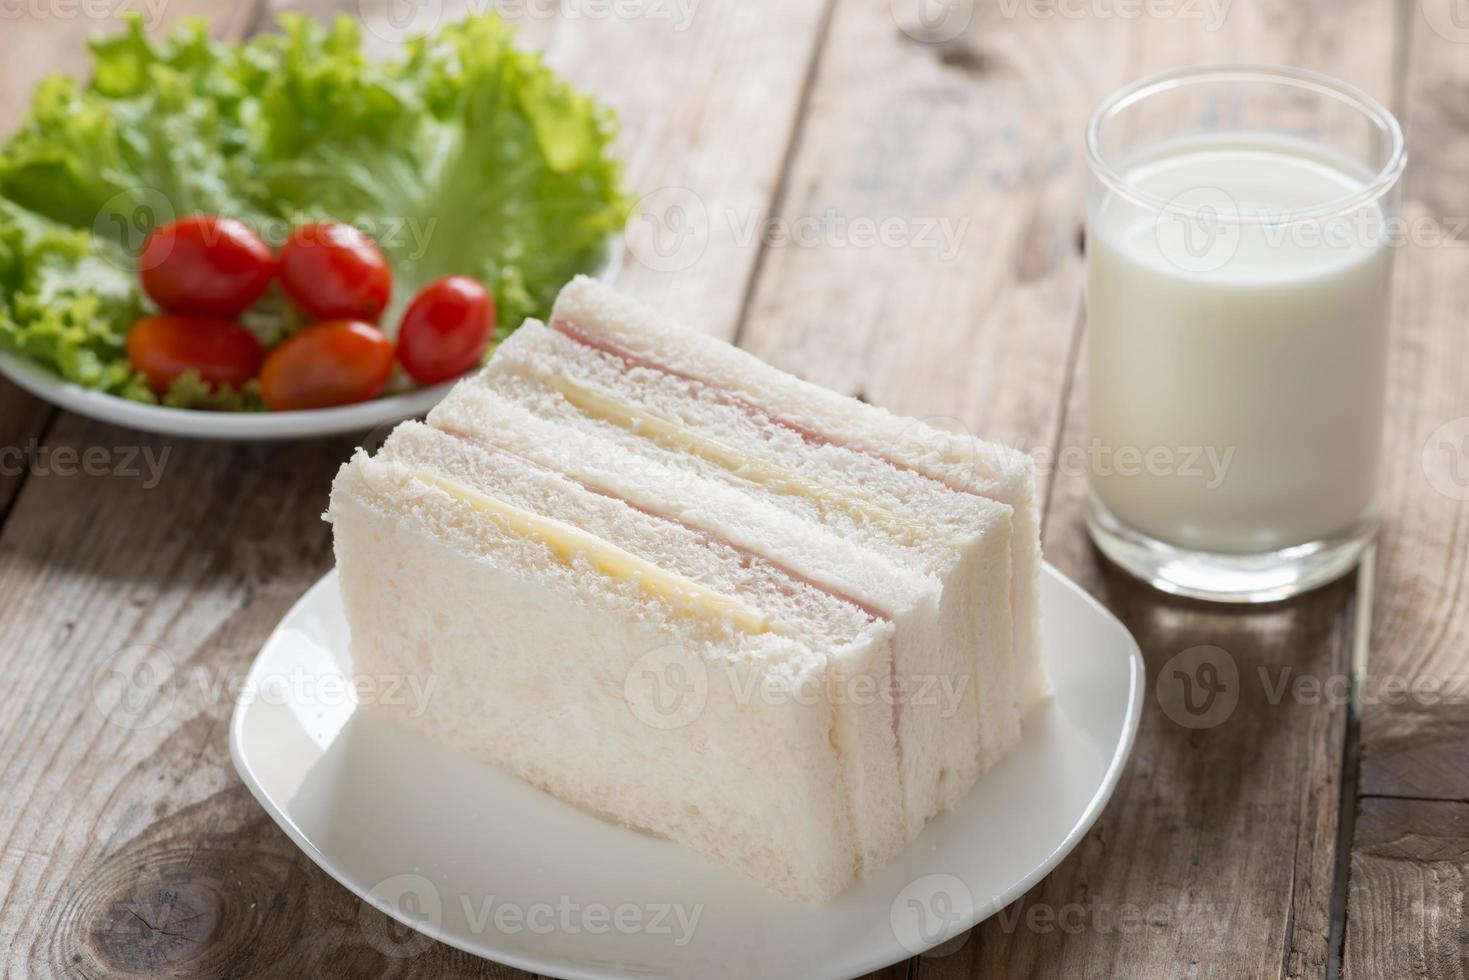 sanduíche, presunto com queijo e leite na mesa de madeira. foto